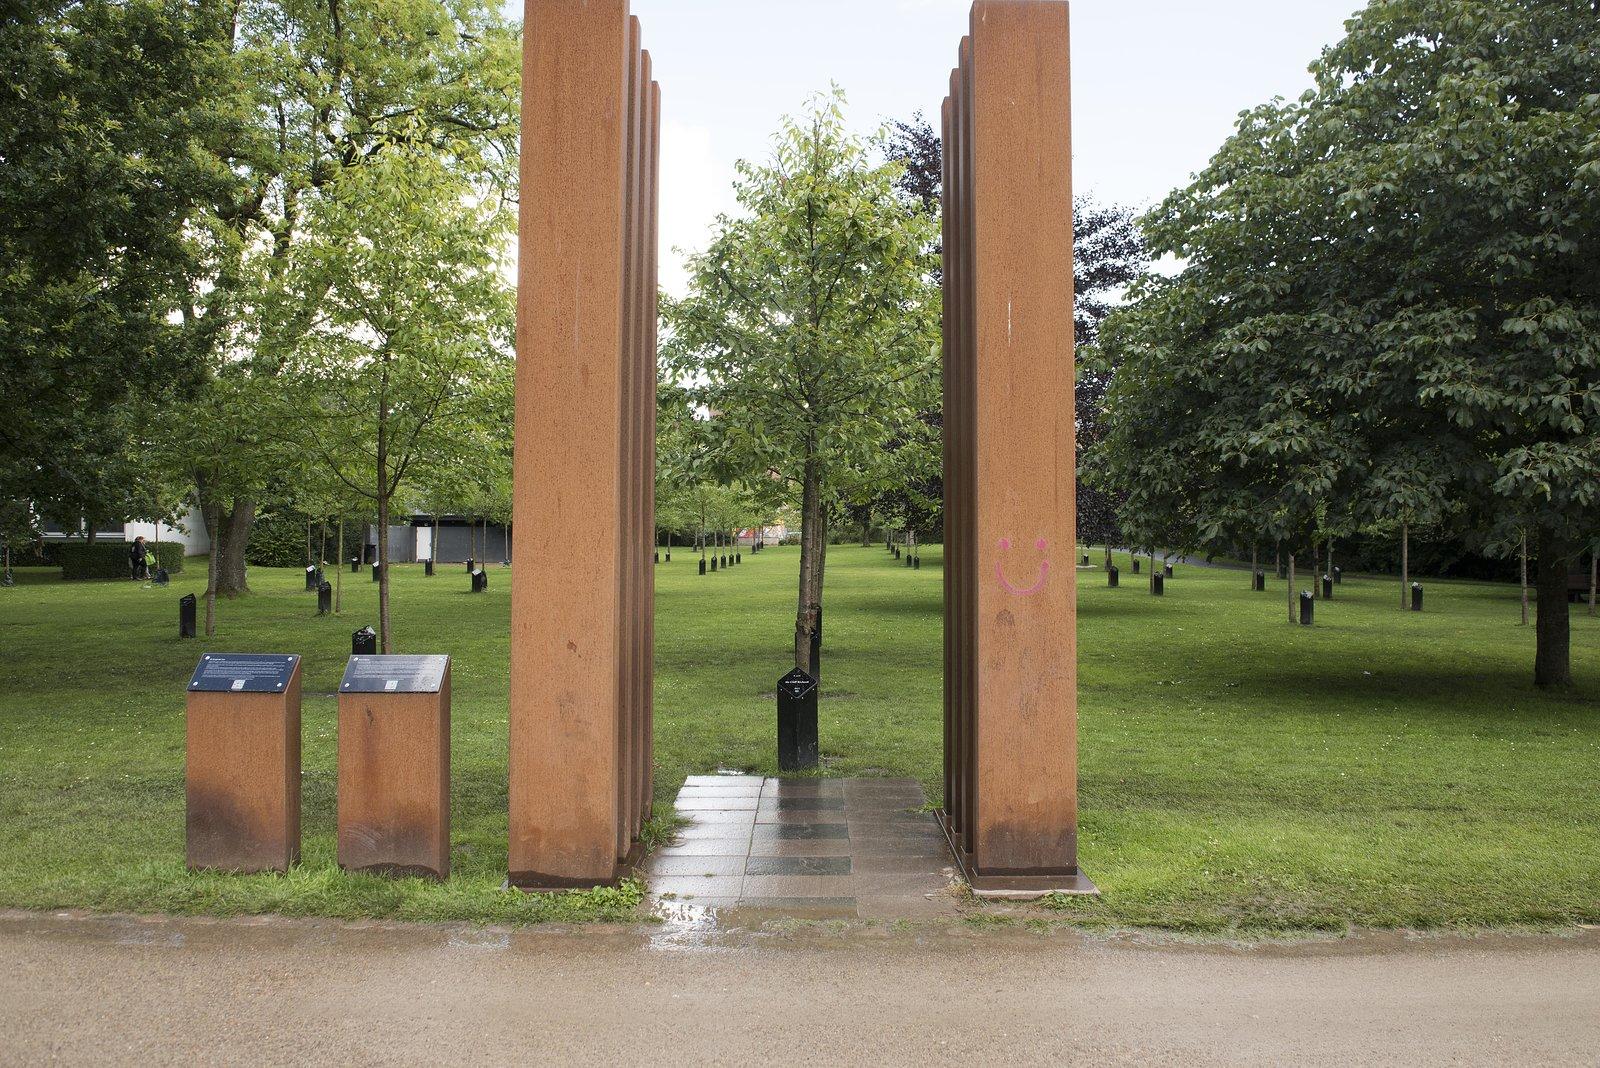 Kildeparken - The Singing Trees